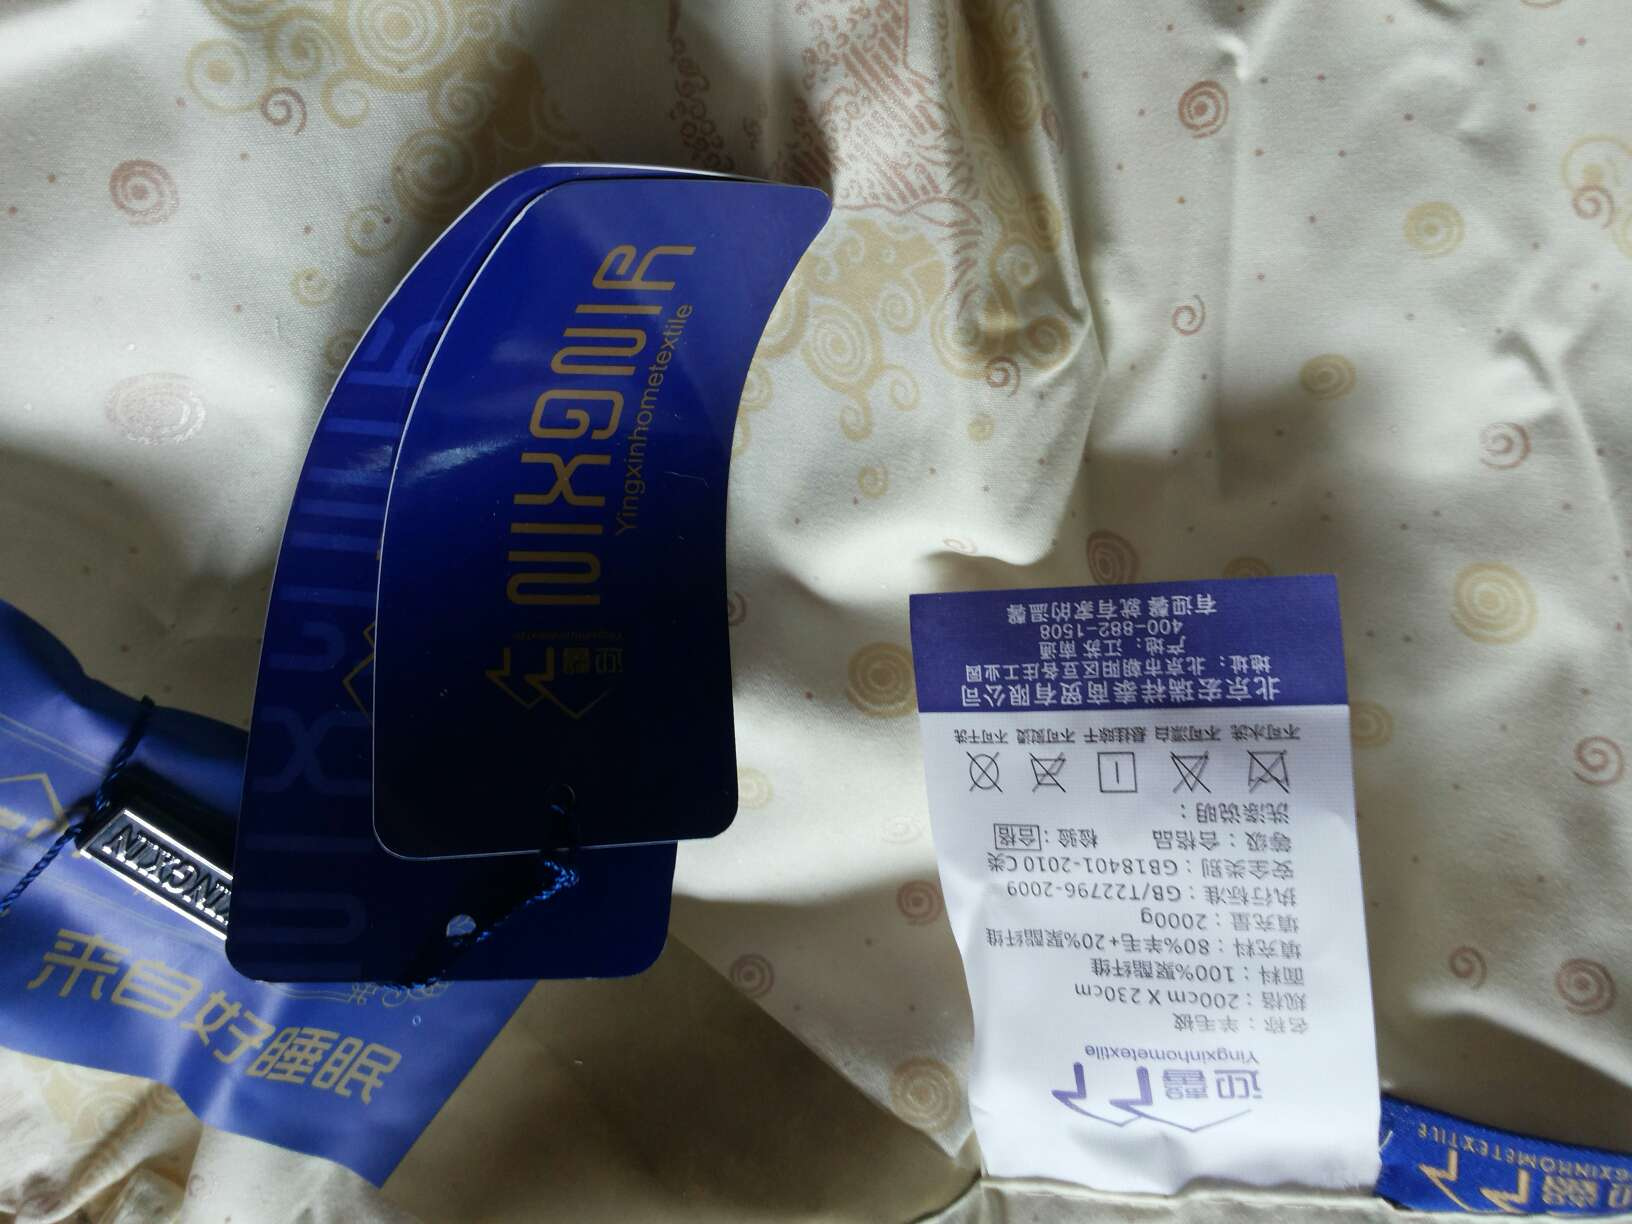 mens flip flops size 13 00298466 forsale